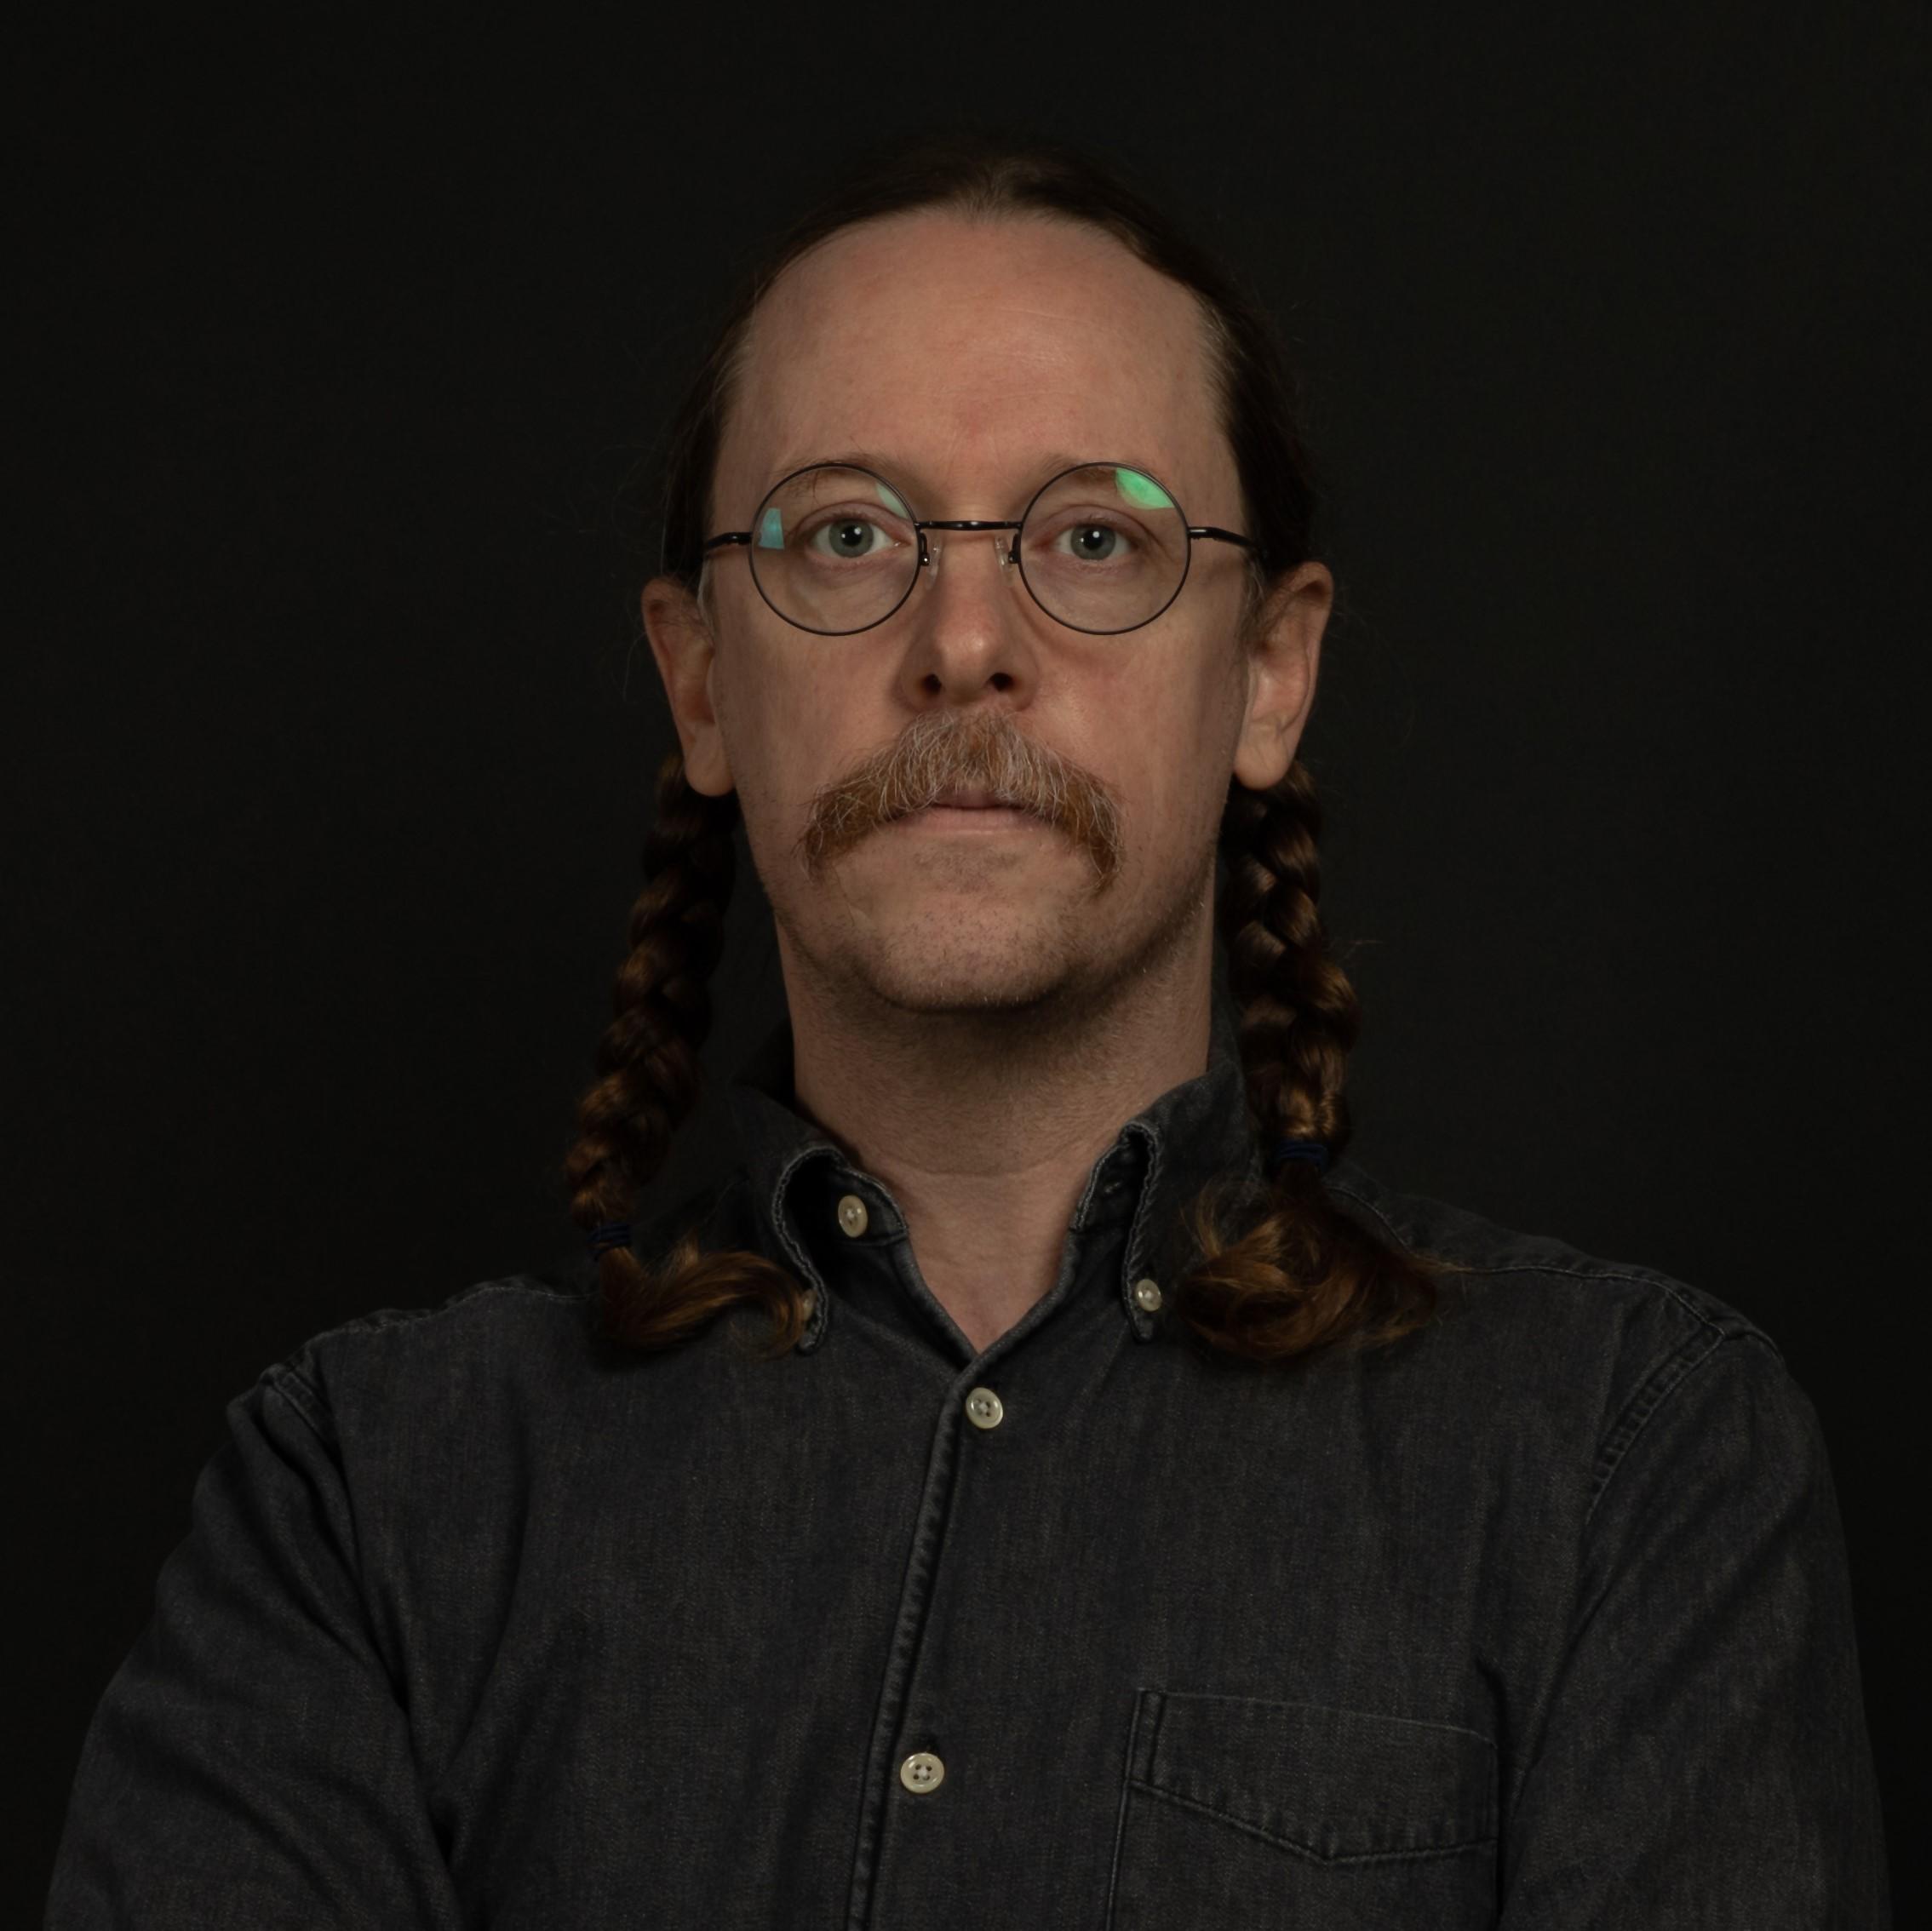 Zach Dodson profile picture photograph